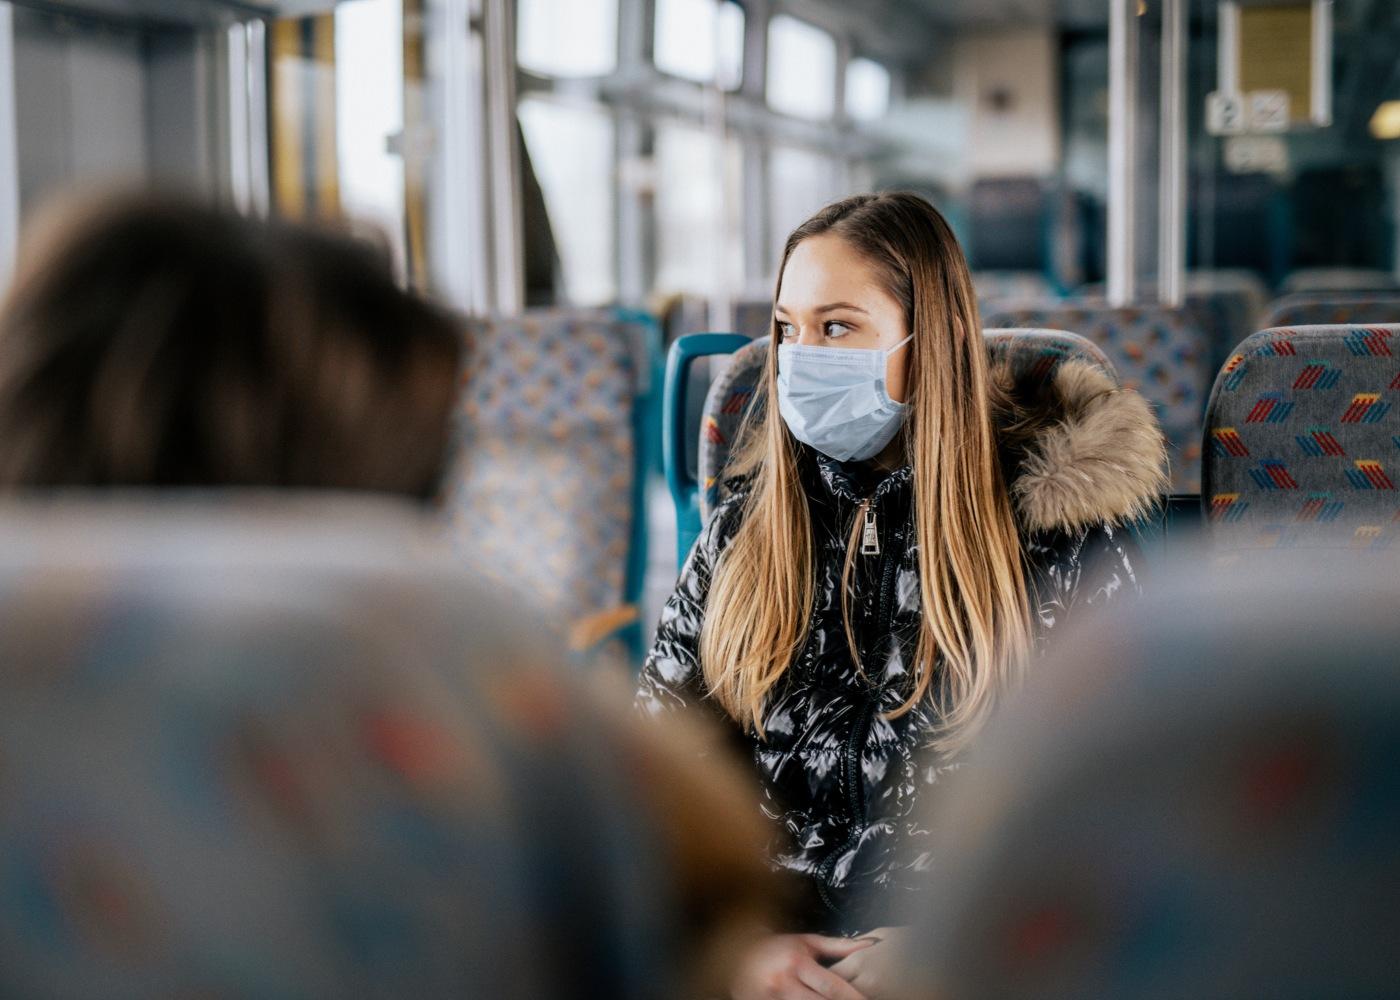 mascara-transportes-publicos